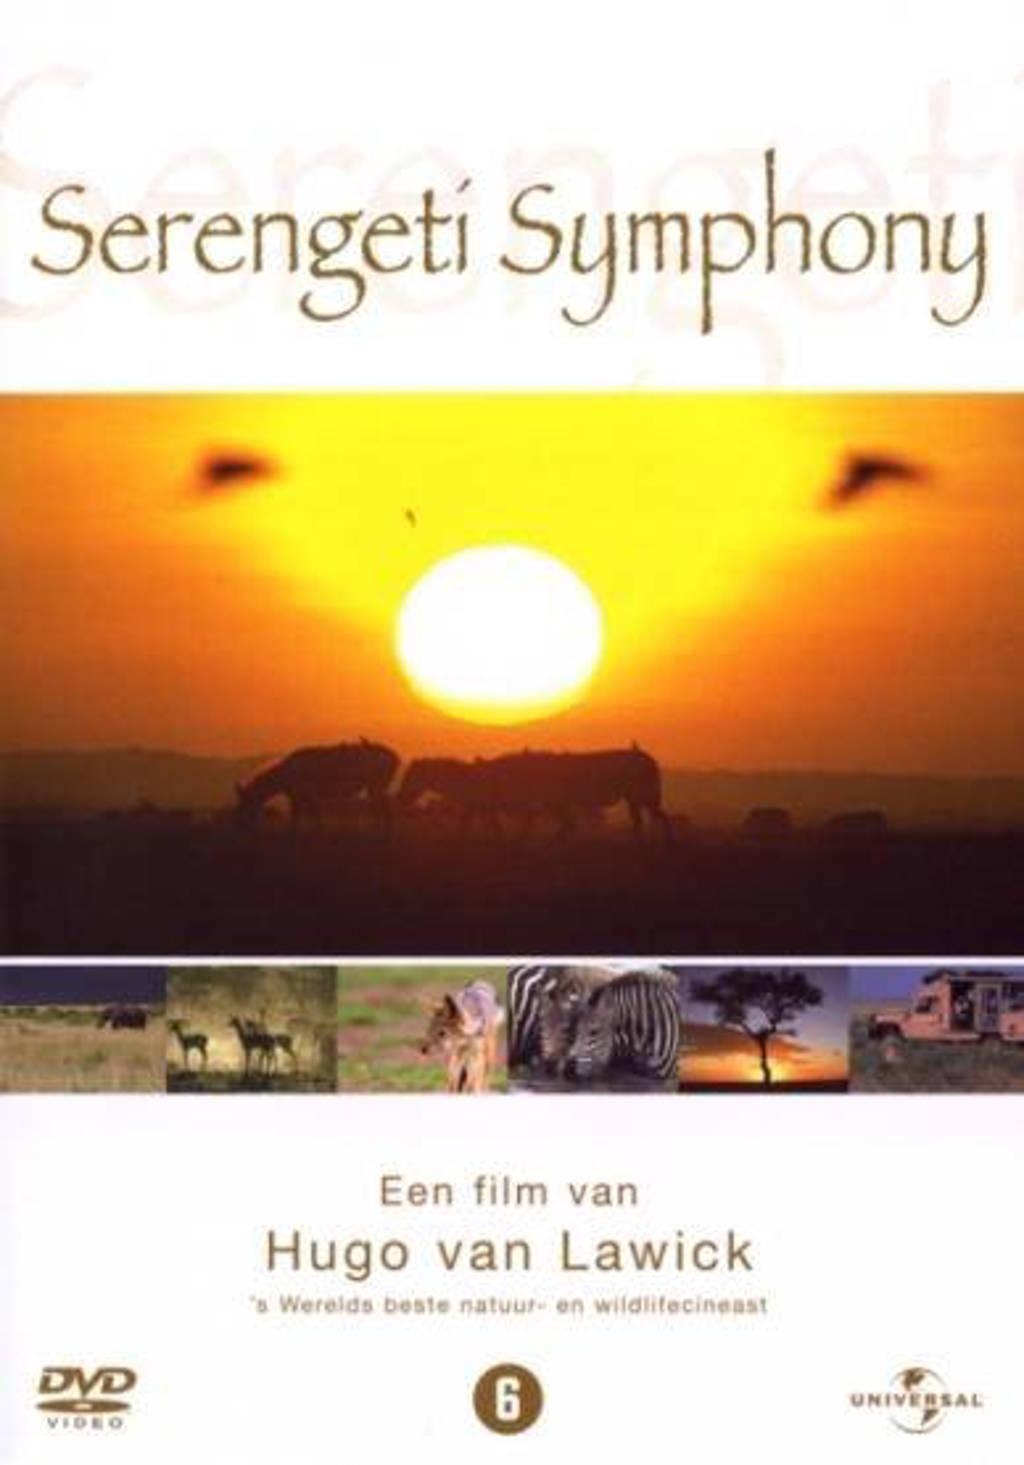 Serengeti symphony (DVD)